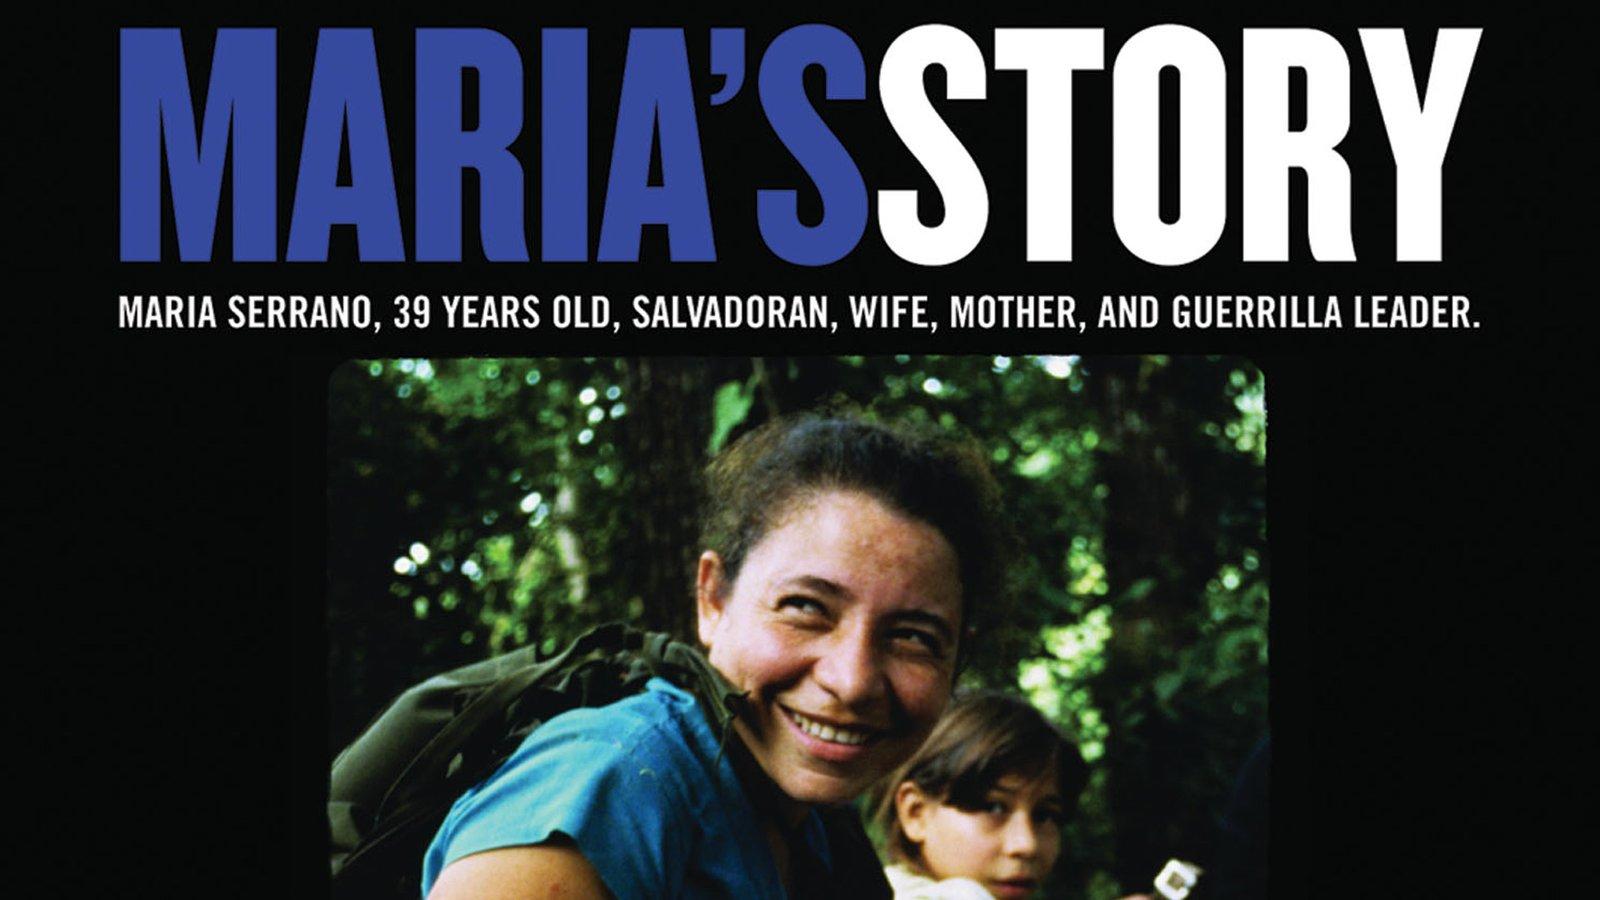 Maria's Story - A Portrait Of Love And Survival In El Salvador's Civil War